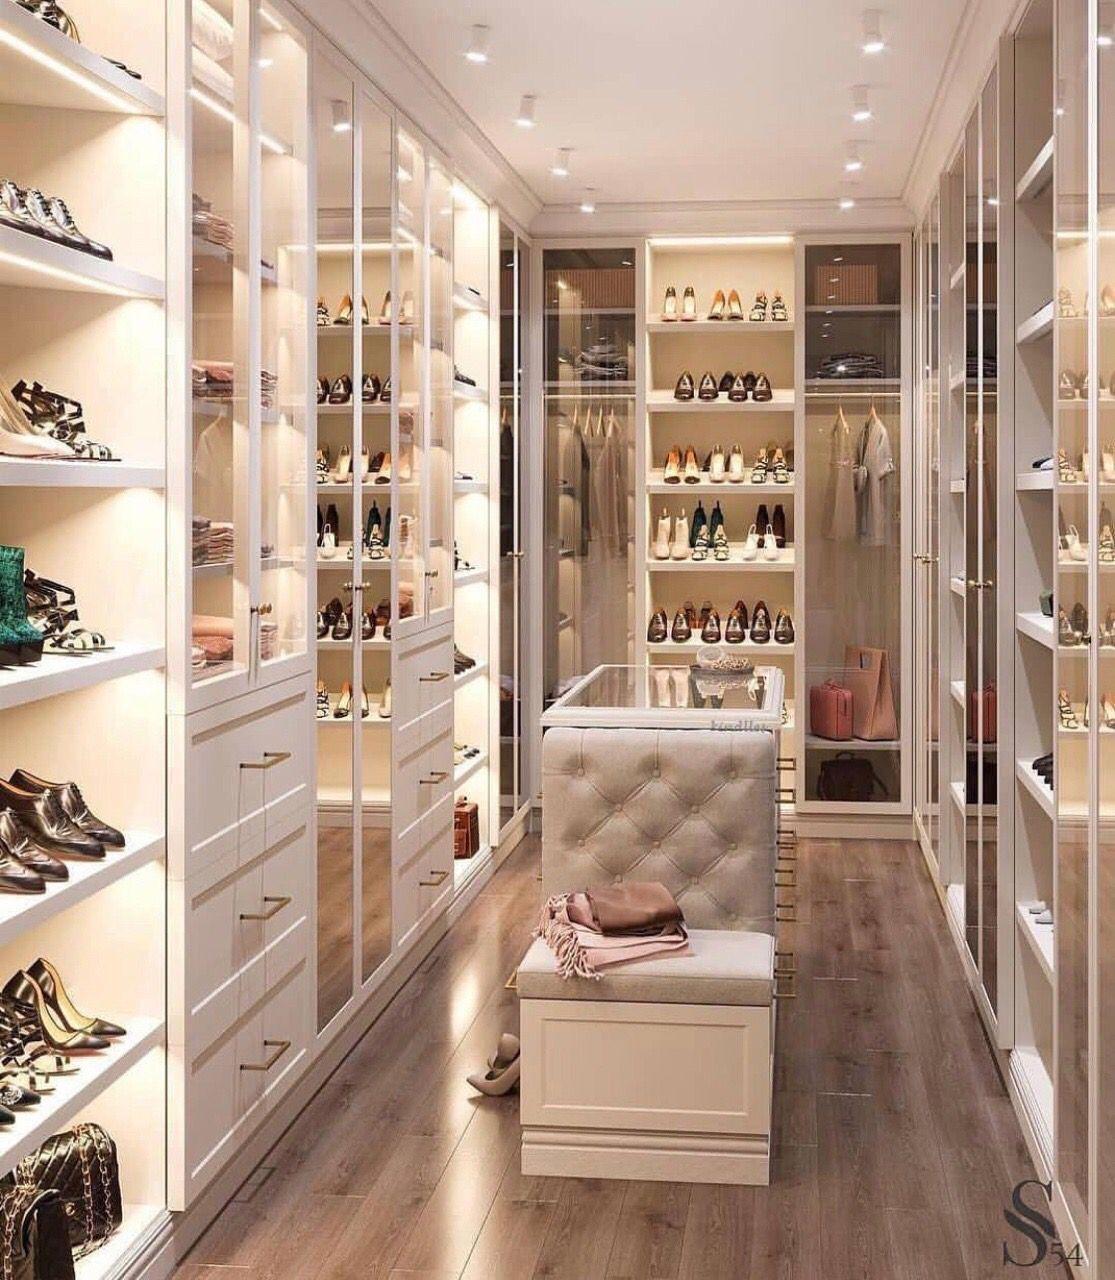 Linen Closet Out Line Wardrobestoragecloset Dream Closet Design House Design Walk In Closet Design